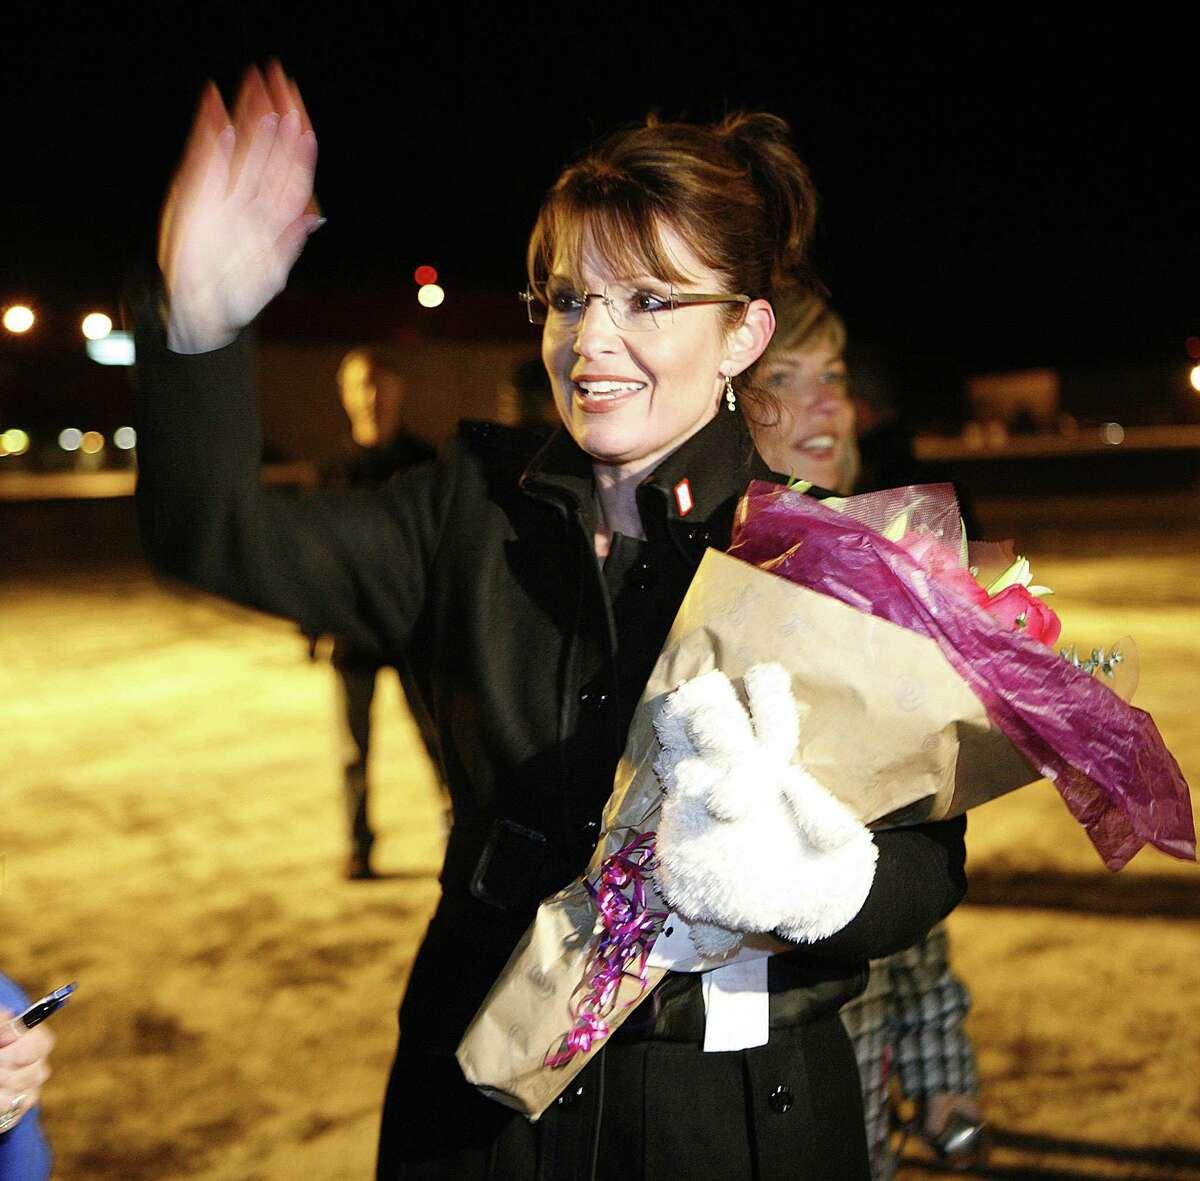 AP Photo/Al Grillo Former Alaska Gov. Sarah Palin greets supporters after returning to Anchorage, Alaska in 2008.